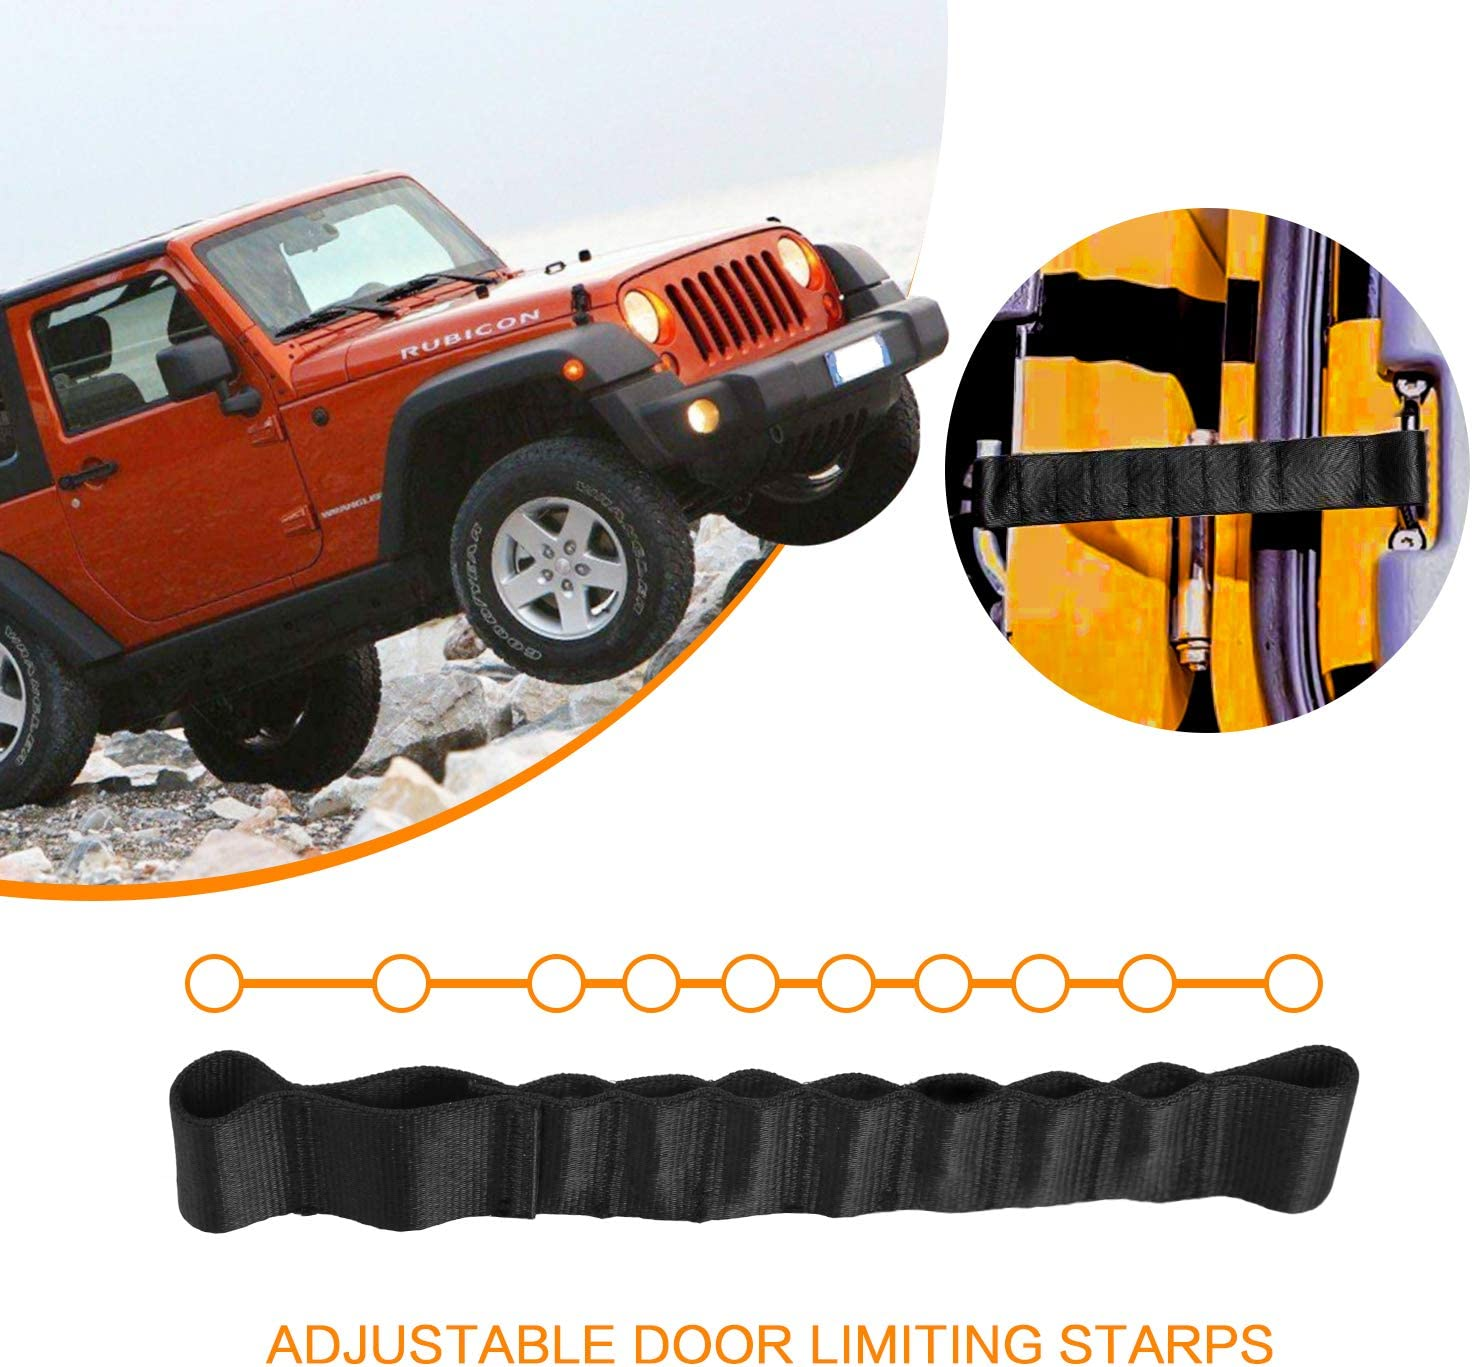 2 PCS Jeep Wrangler Door Limiting Straps Jeep Wrangler Adjustable Check Jeep Door Straps for 2007-2018 Jeep Wrangler JK